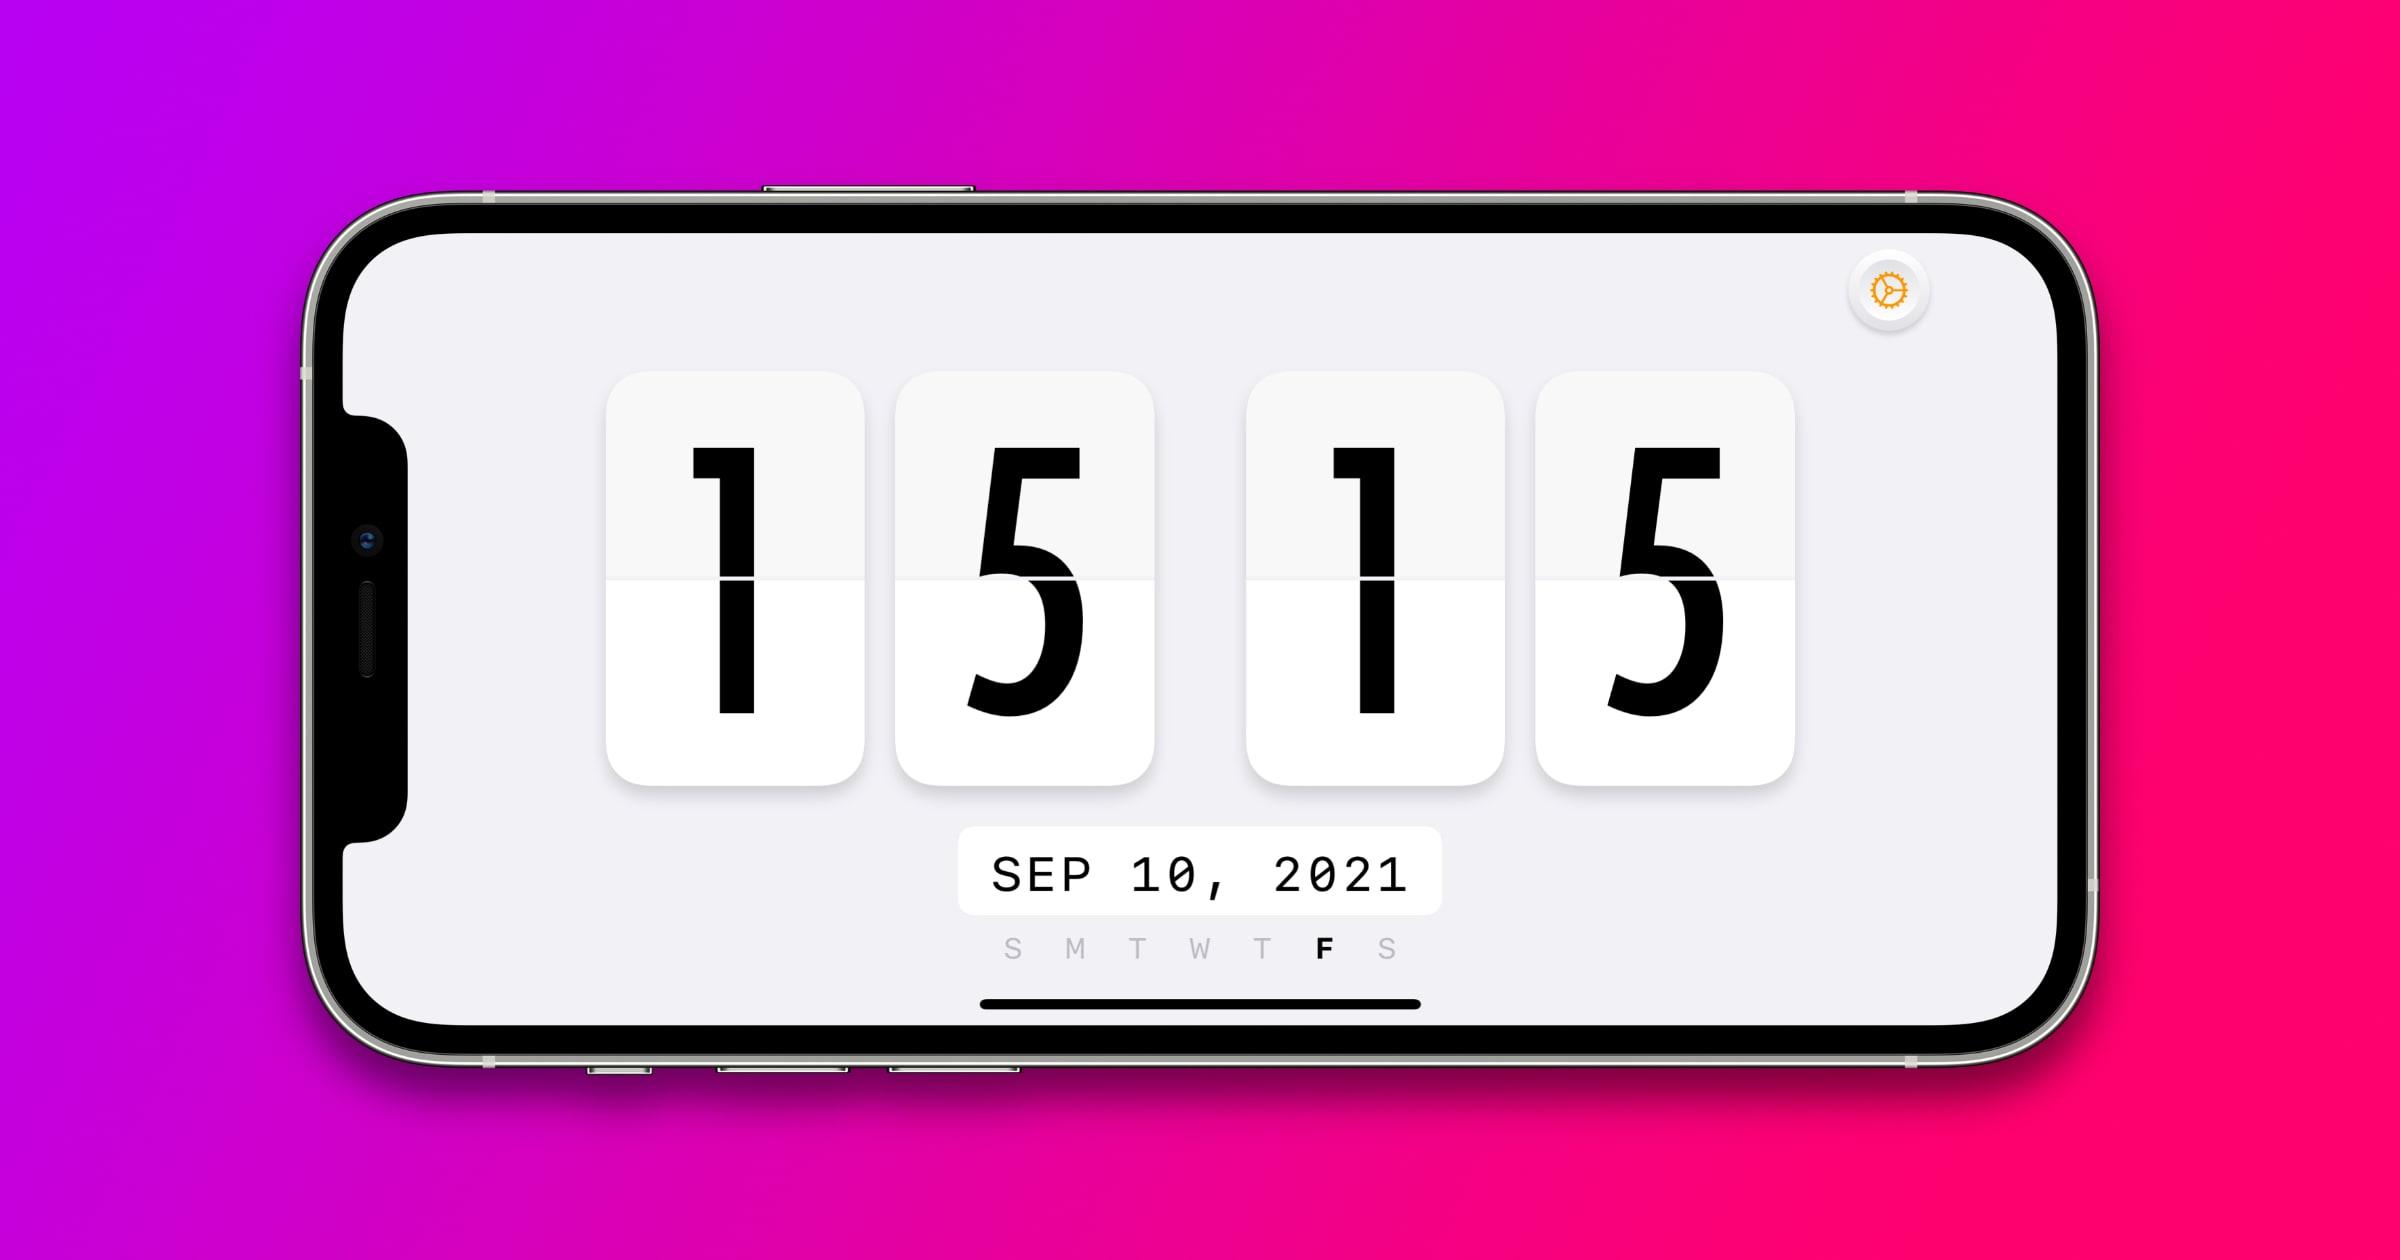 'McClockface' Update 1.3 Adds New Home Screen Widgets